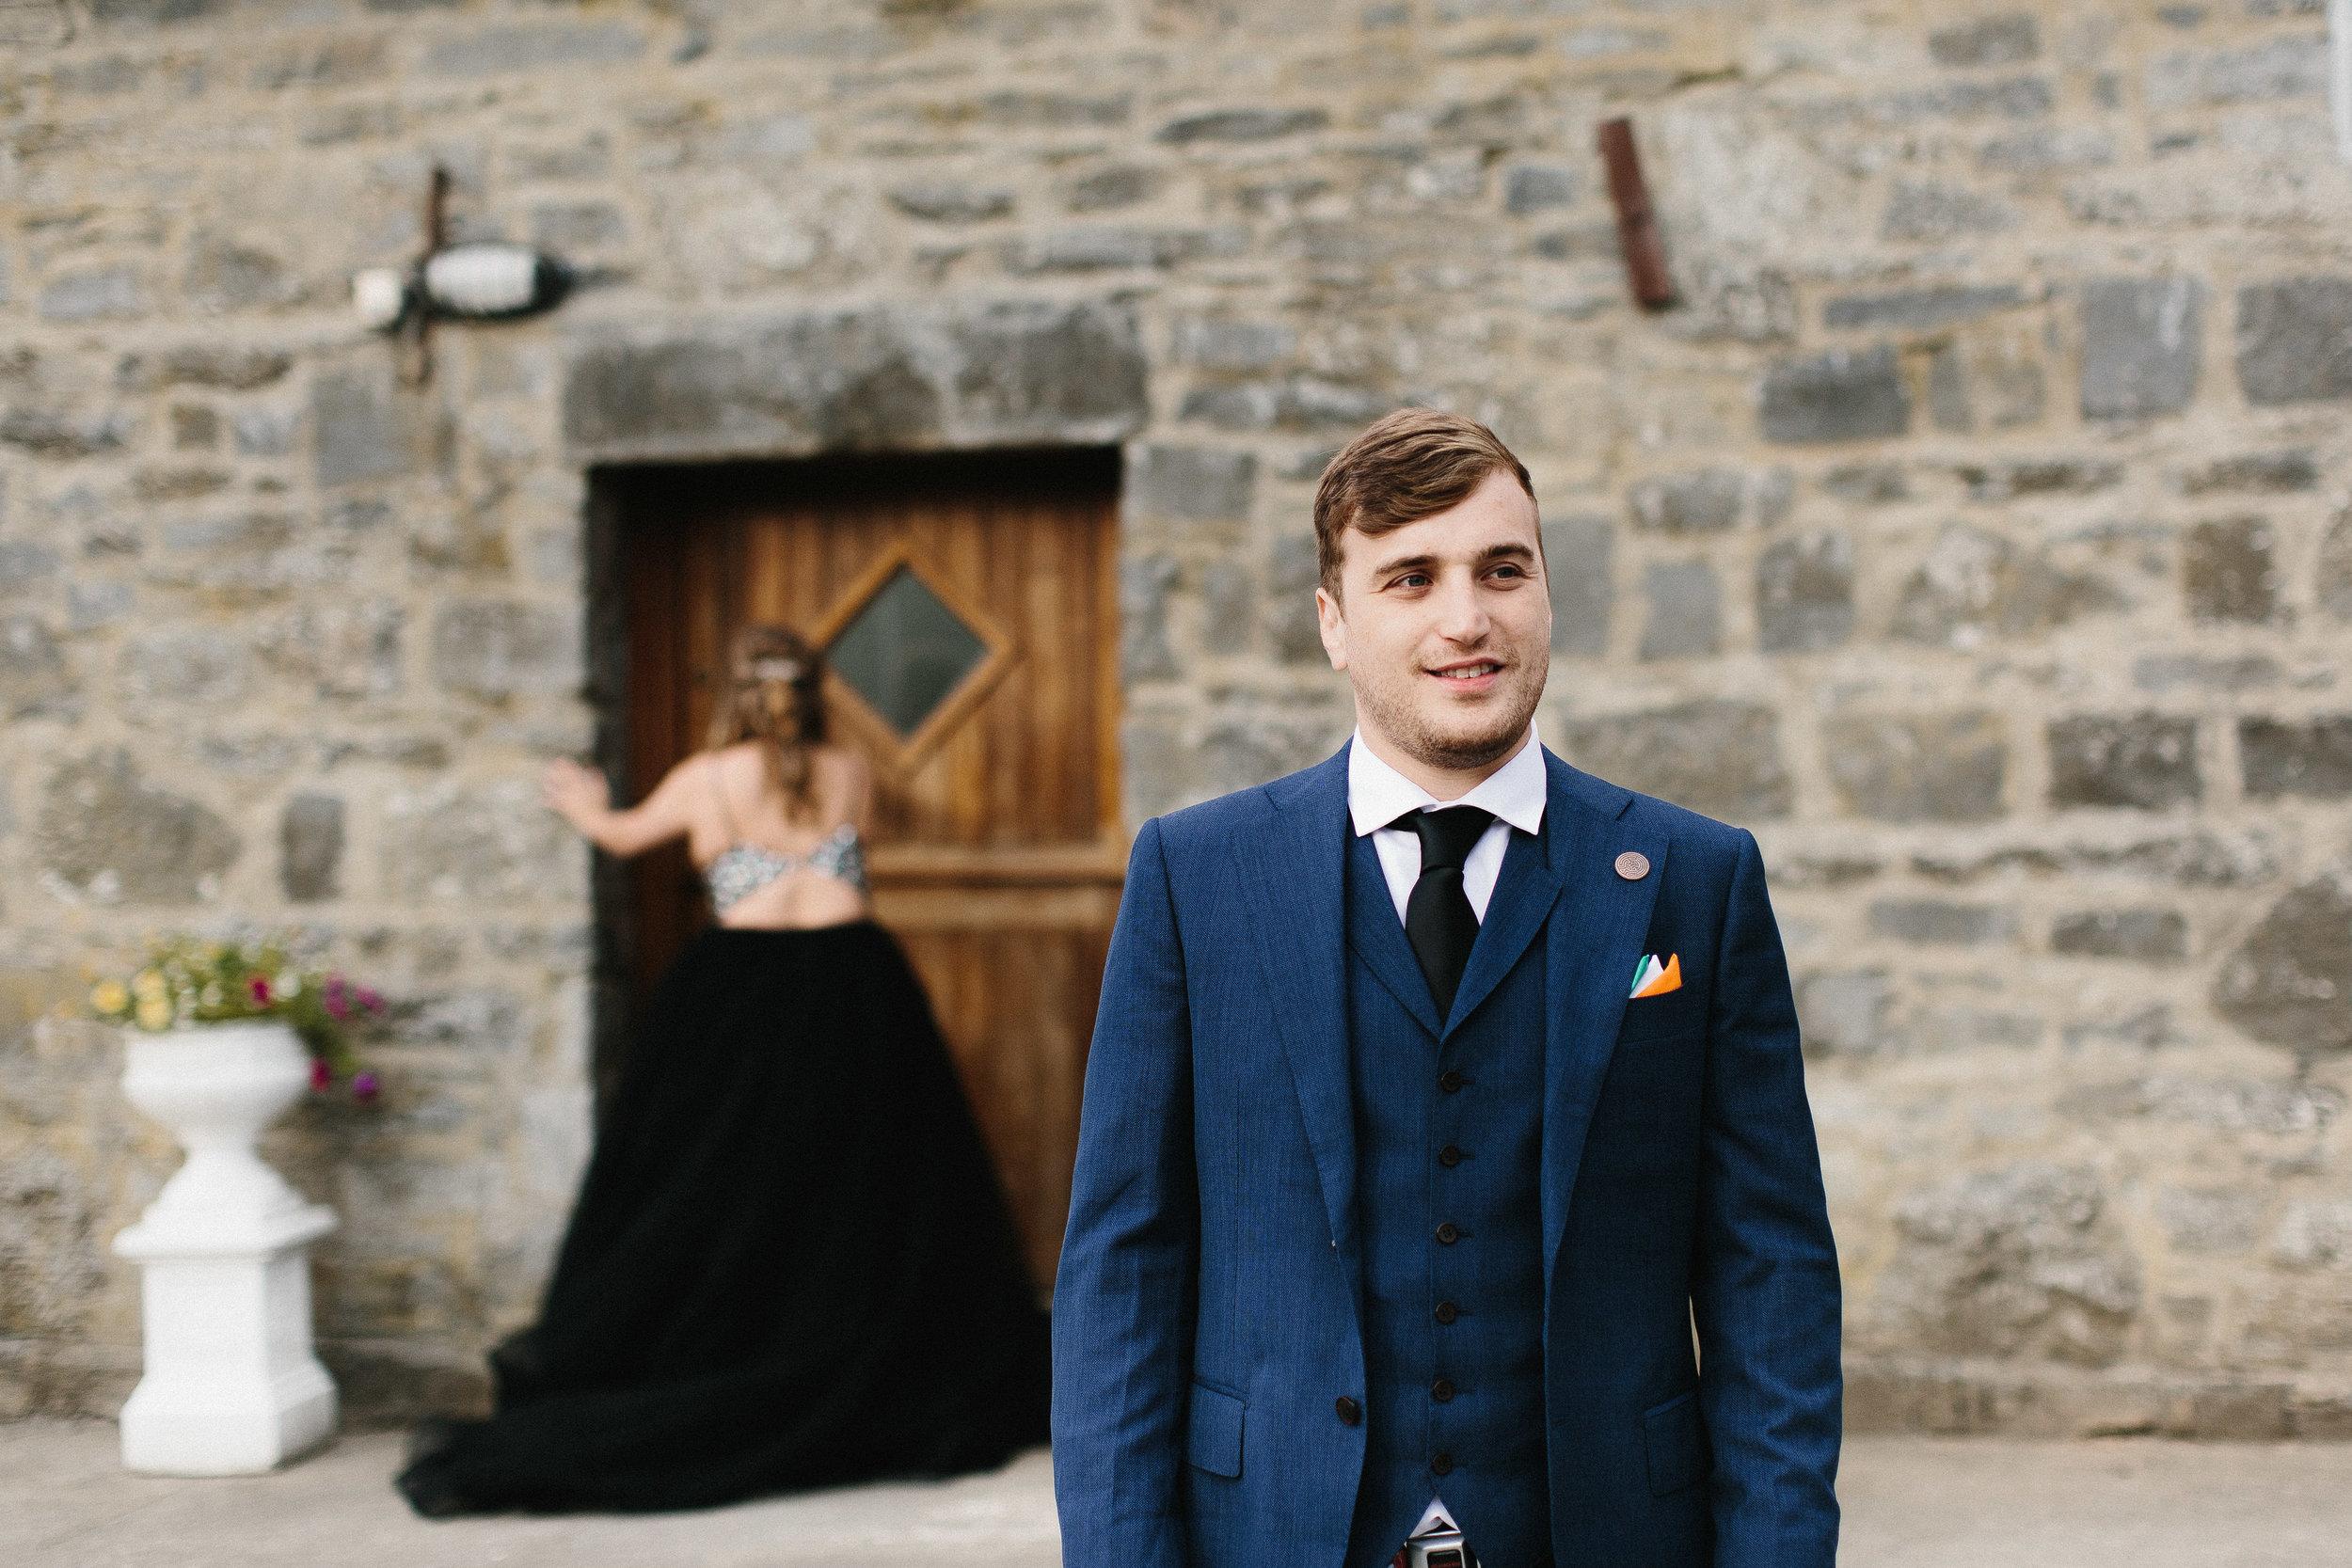 ireland_elopement_black_wedding_dress_wicklow_glendalough_athy_st_kevins_way_1069.jpg